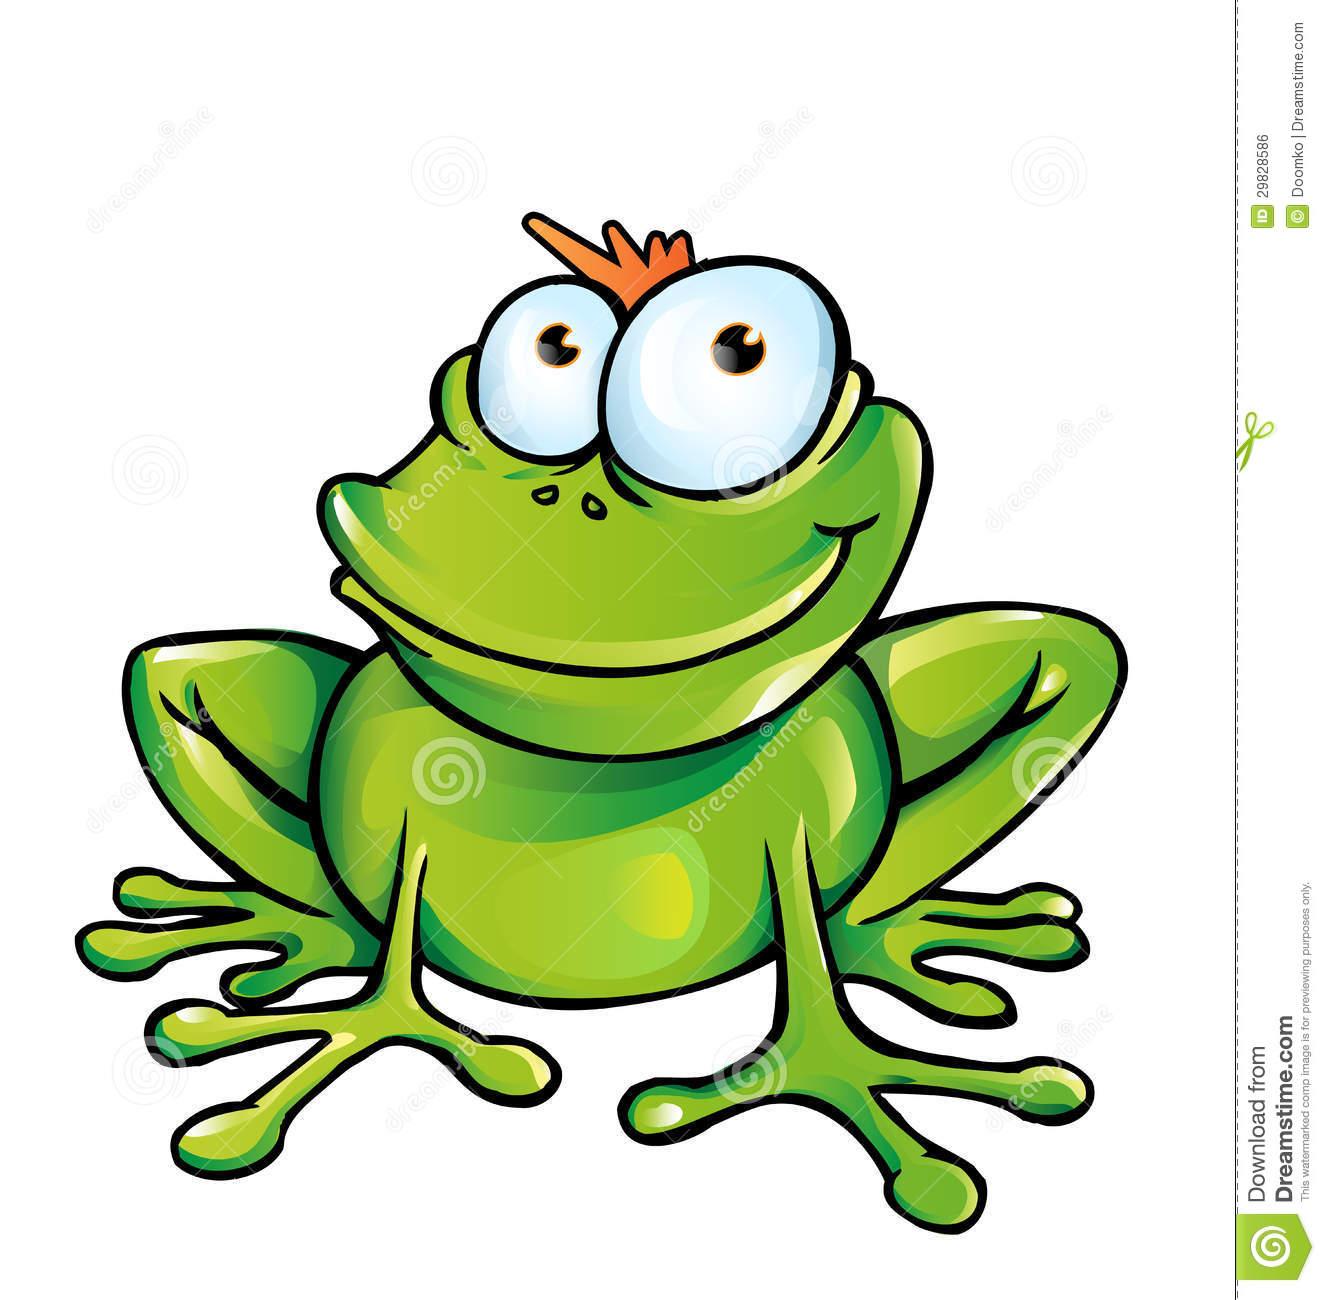 Cartoon Frog Clipart - Clipart Kid